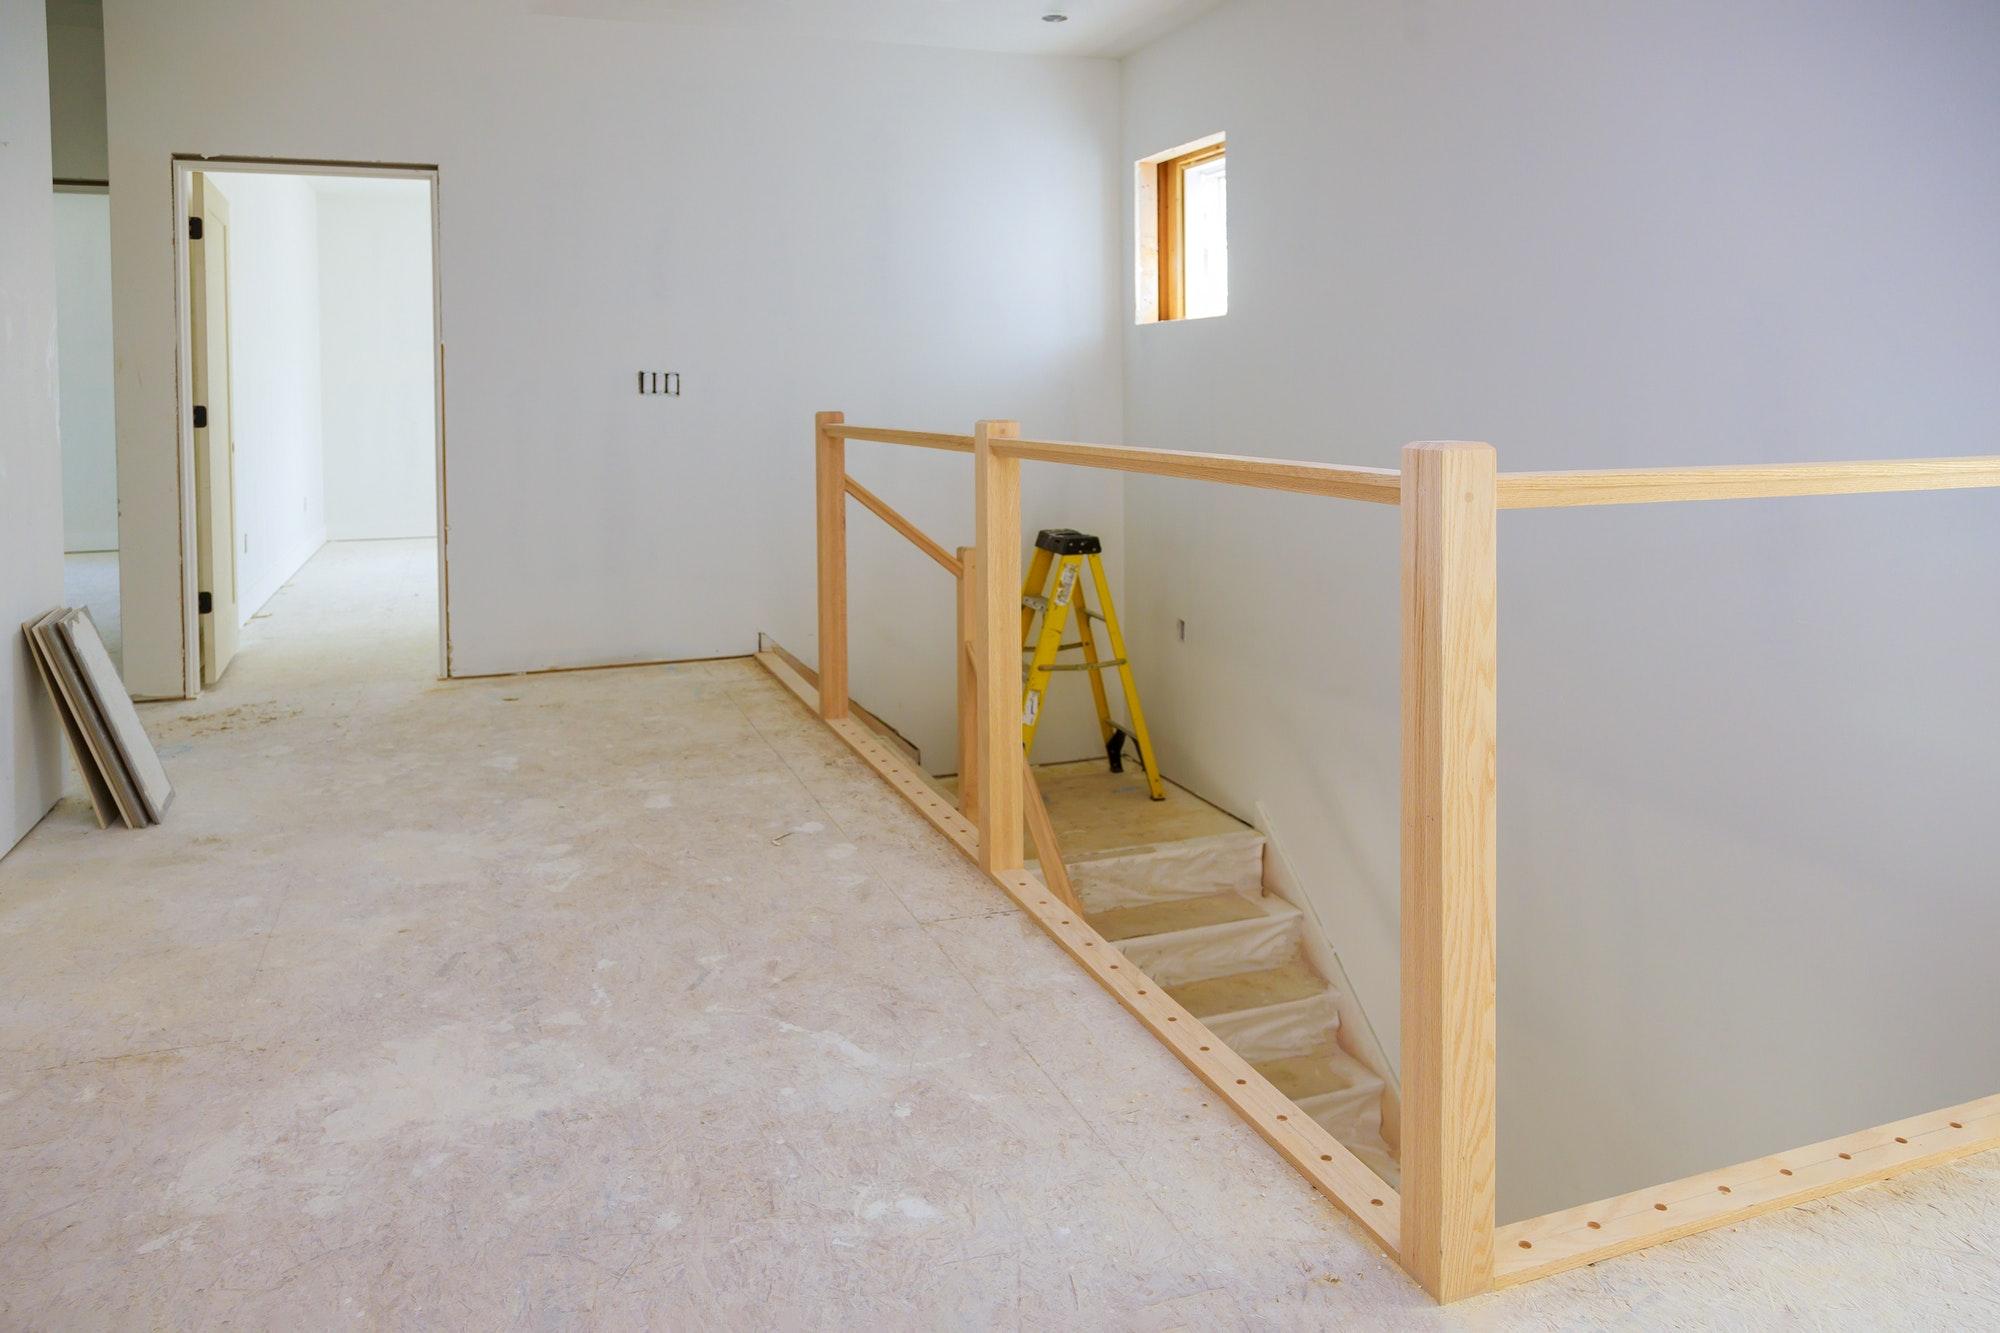 Interior construction of housing project with molding installedServicios Proyectos Reformas Locales